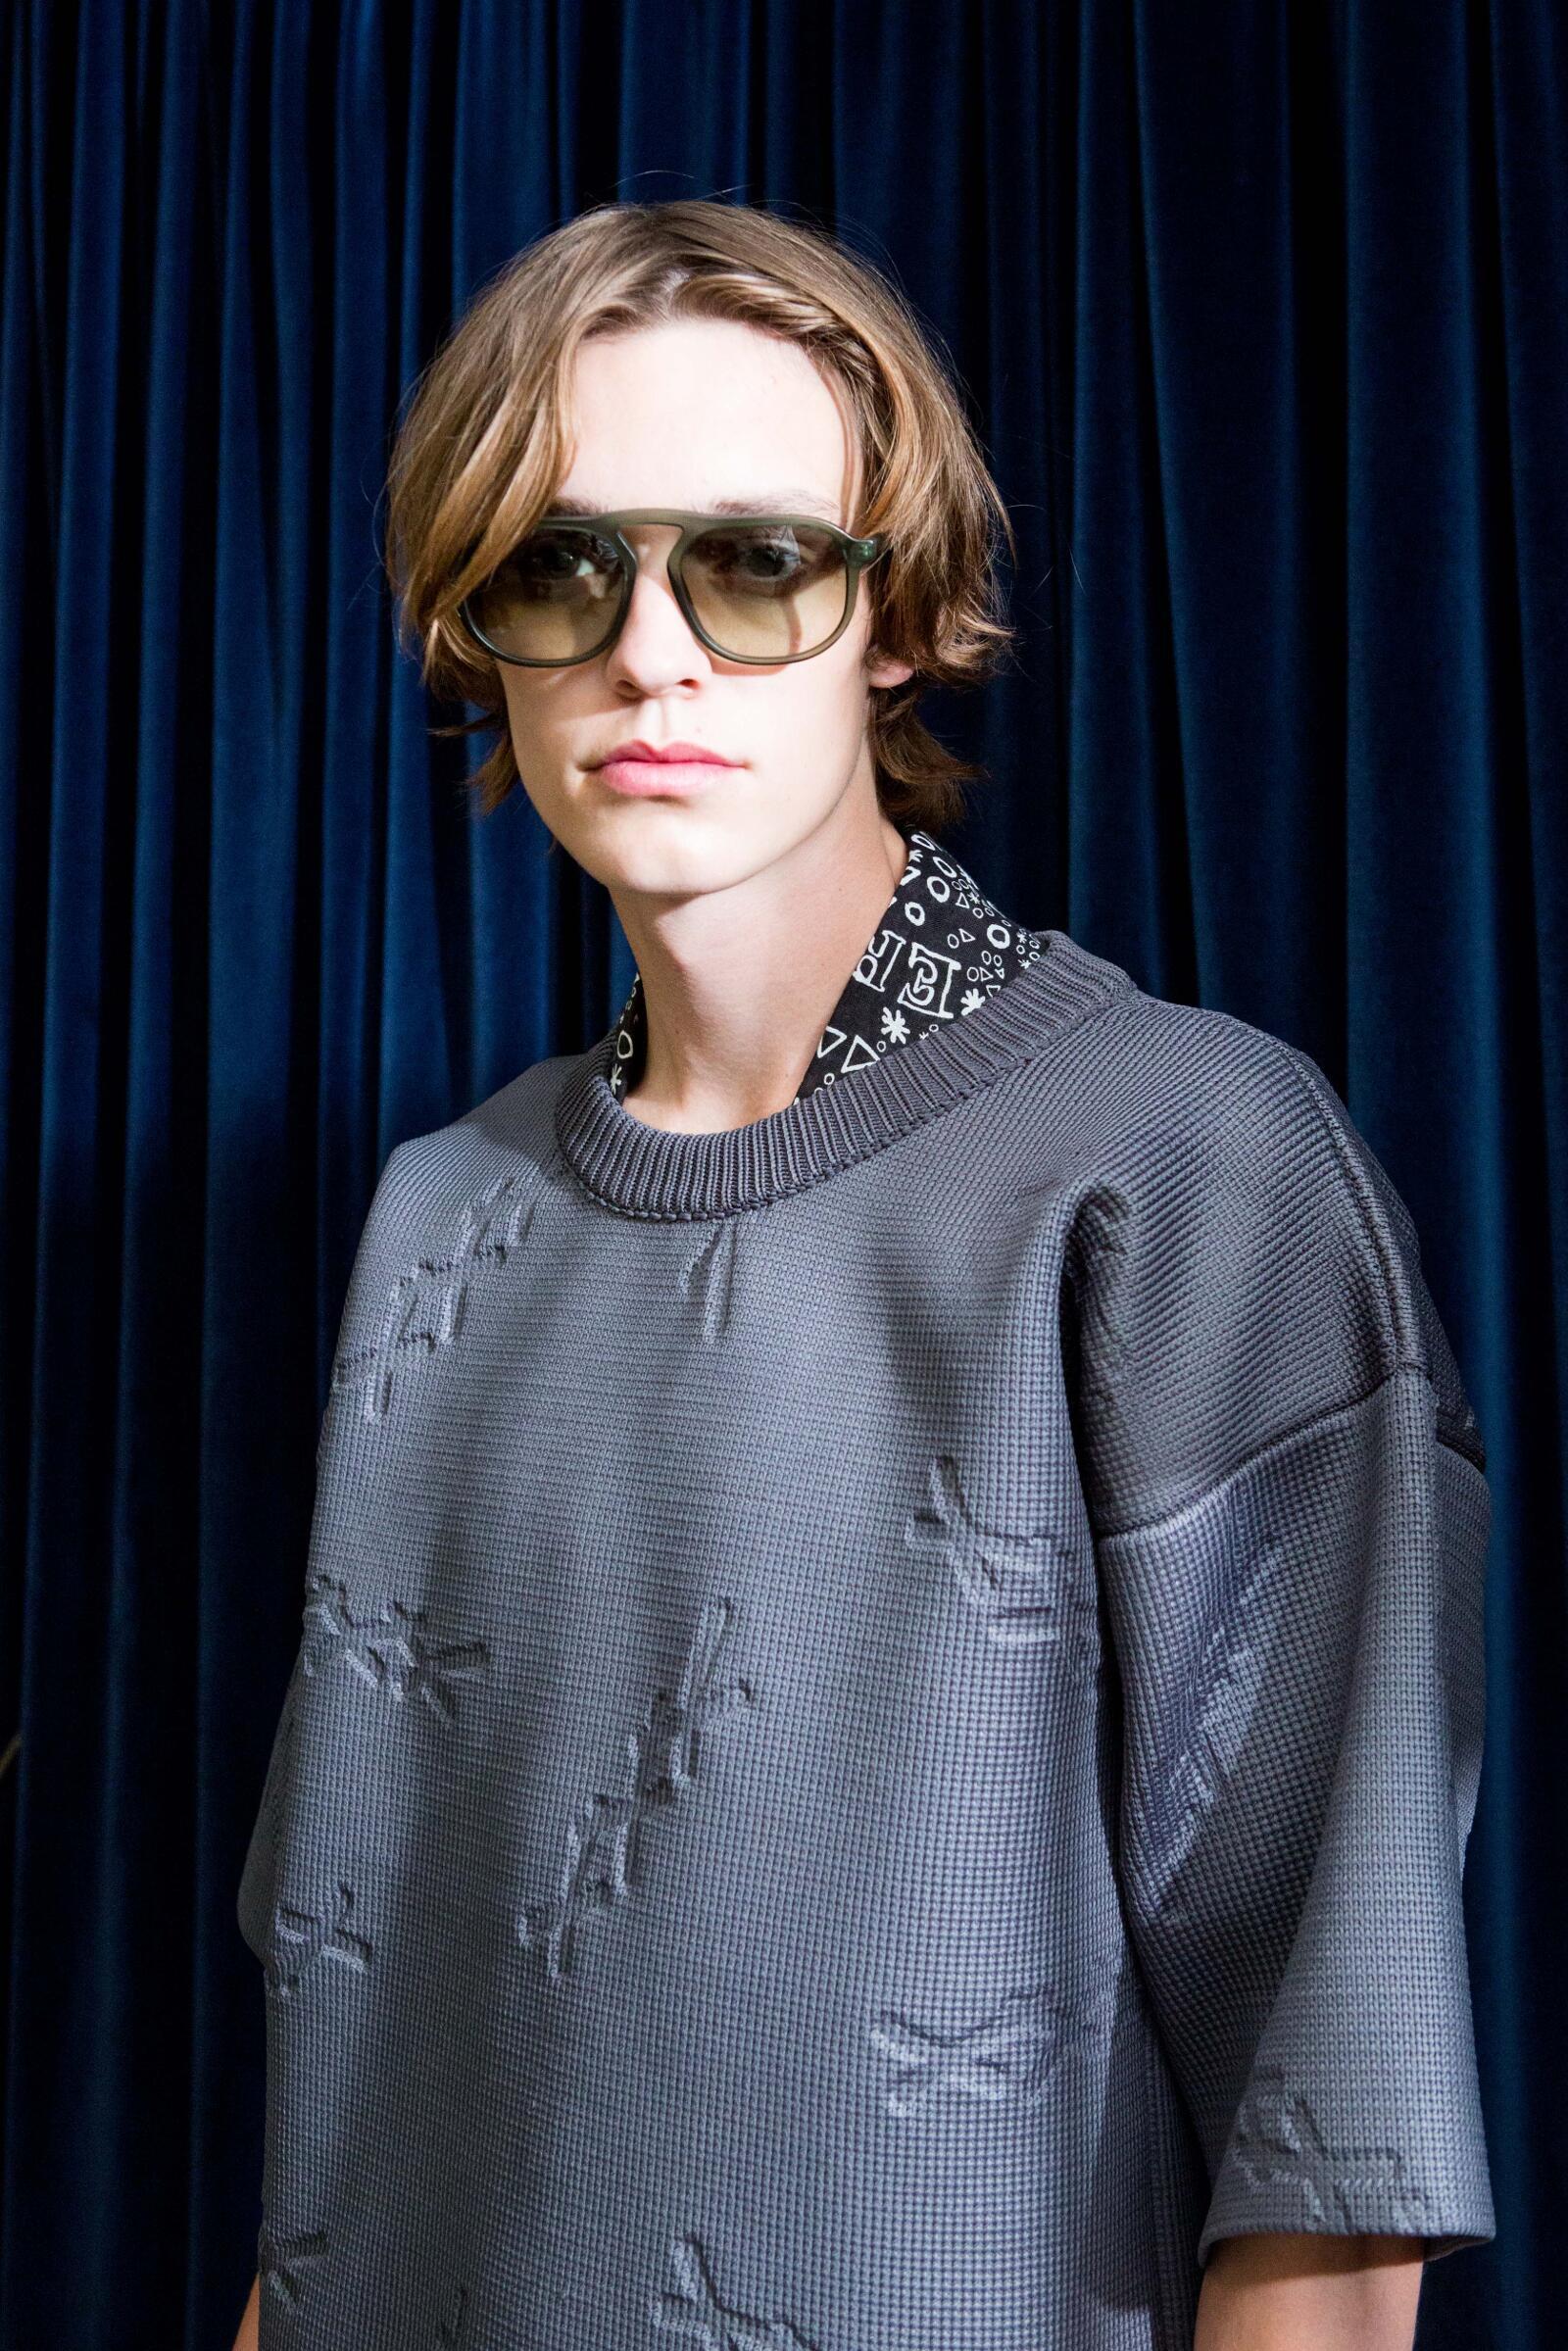 Man Model 2019 Backstage Ermenegildo Zegna Couture